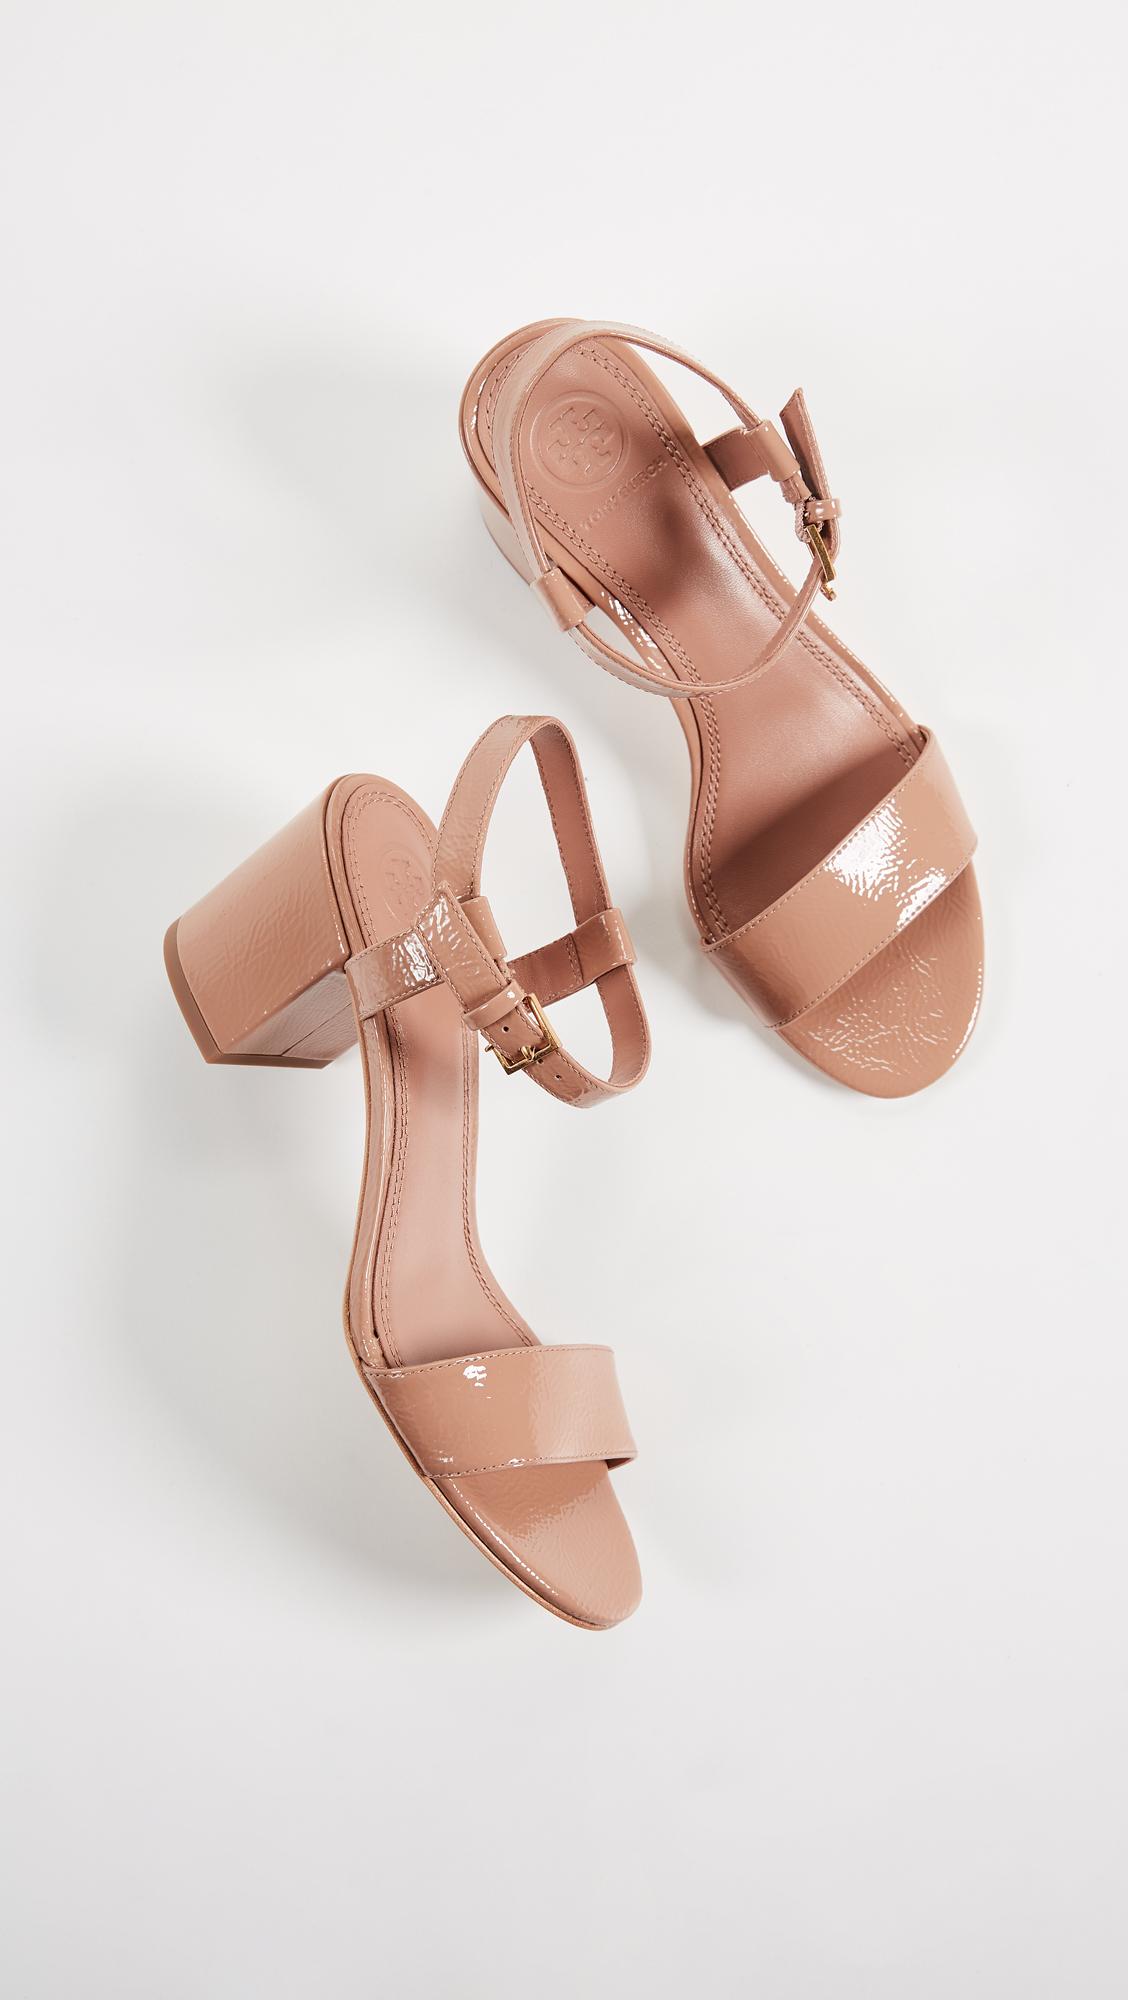 865ef3bd5e5 Tory Burch Laurel 65mm Ankle Strap Sandals